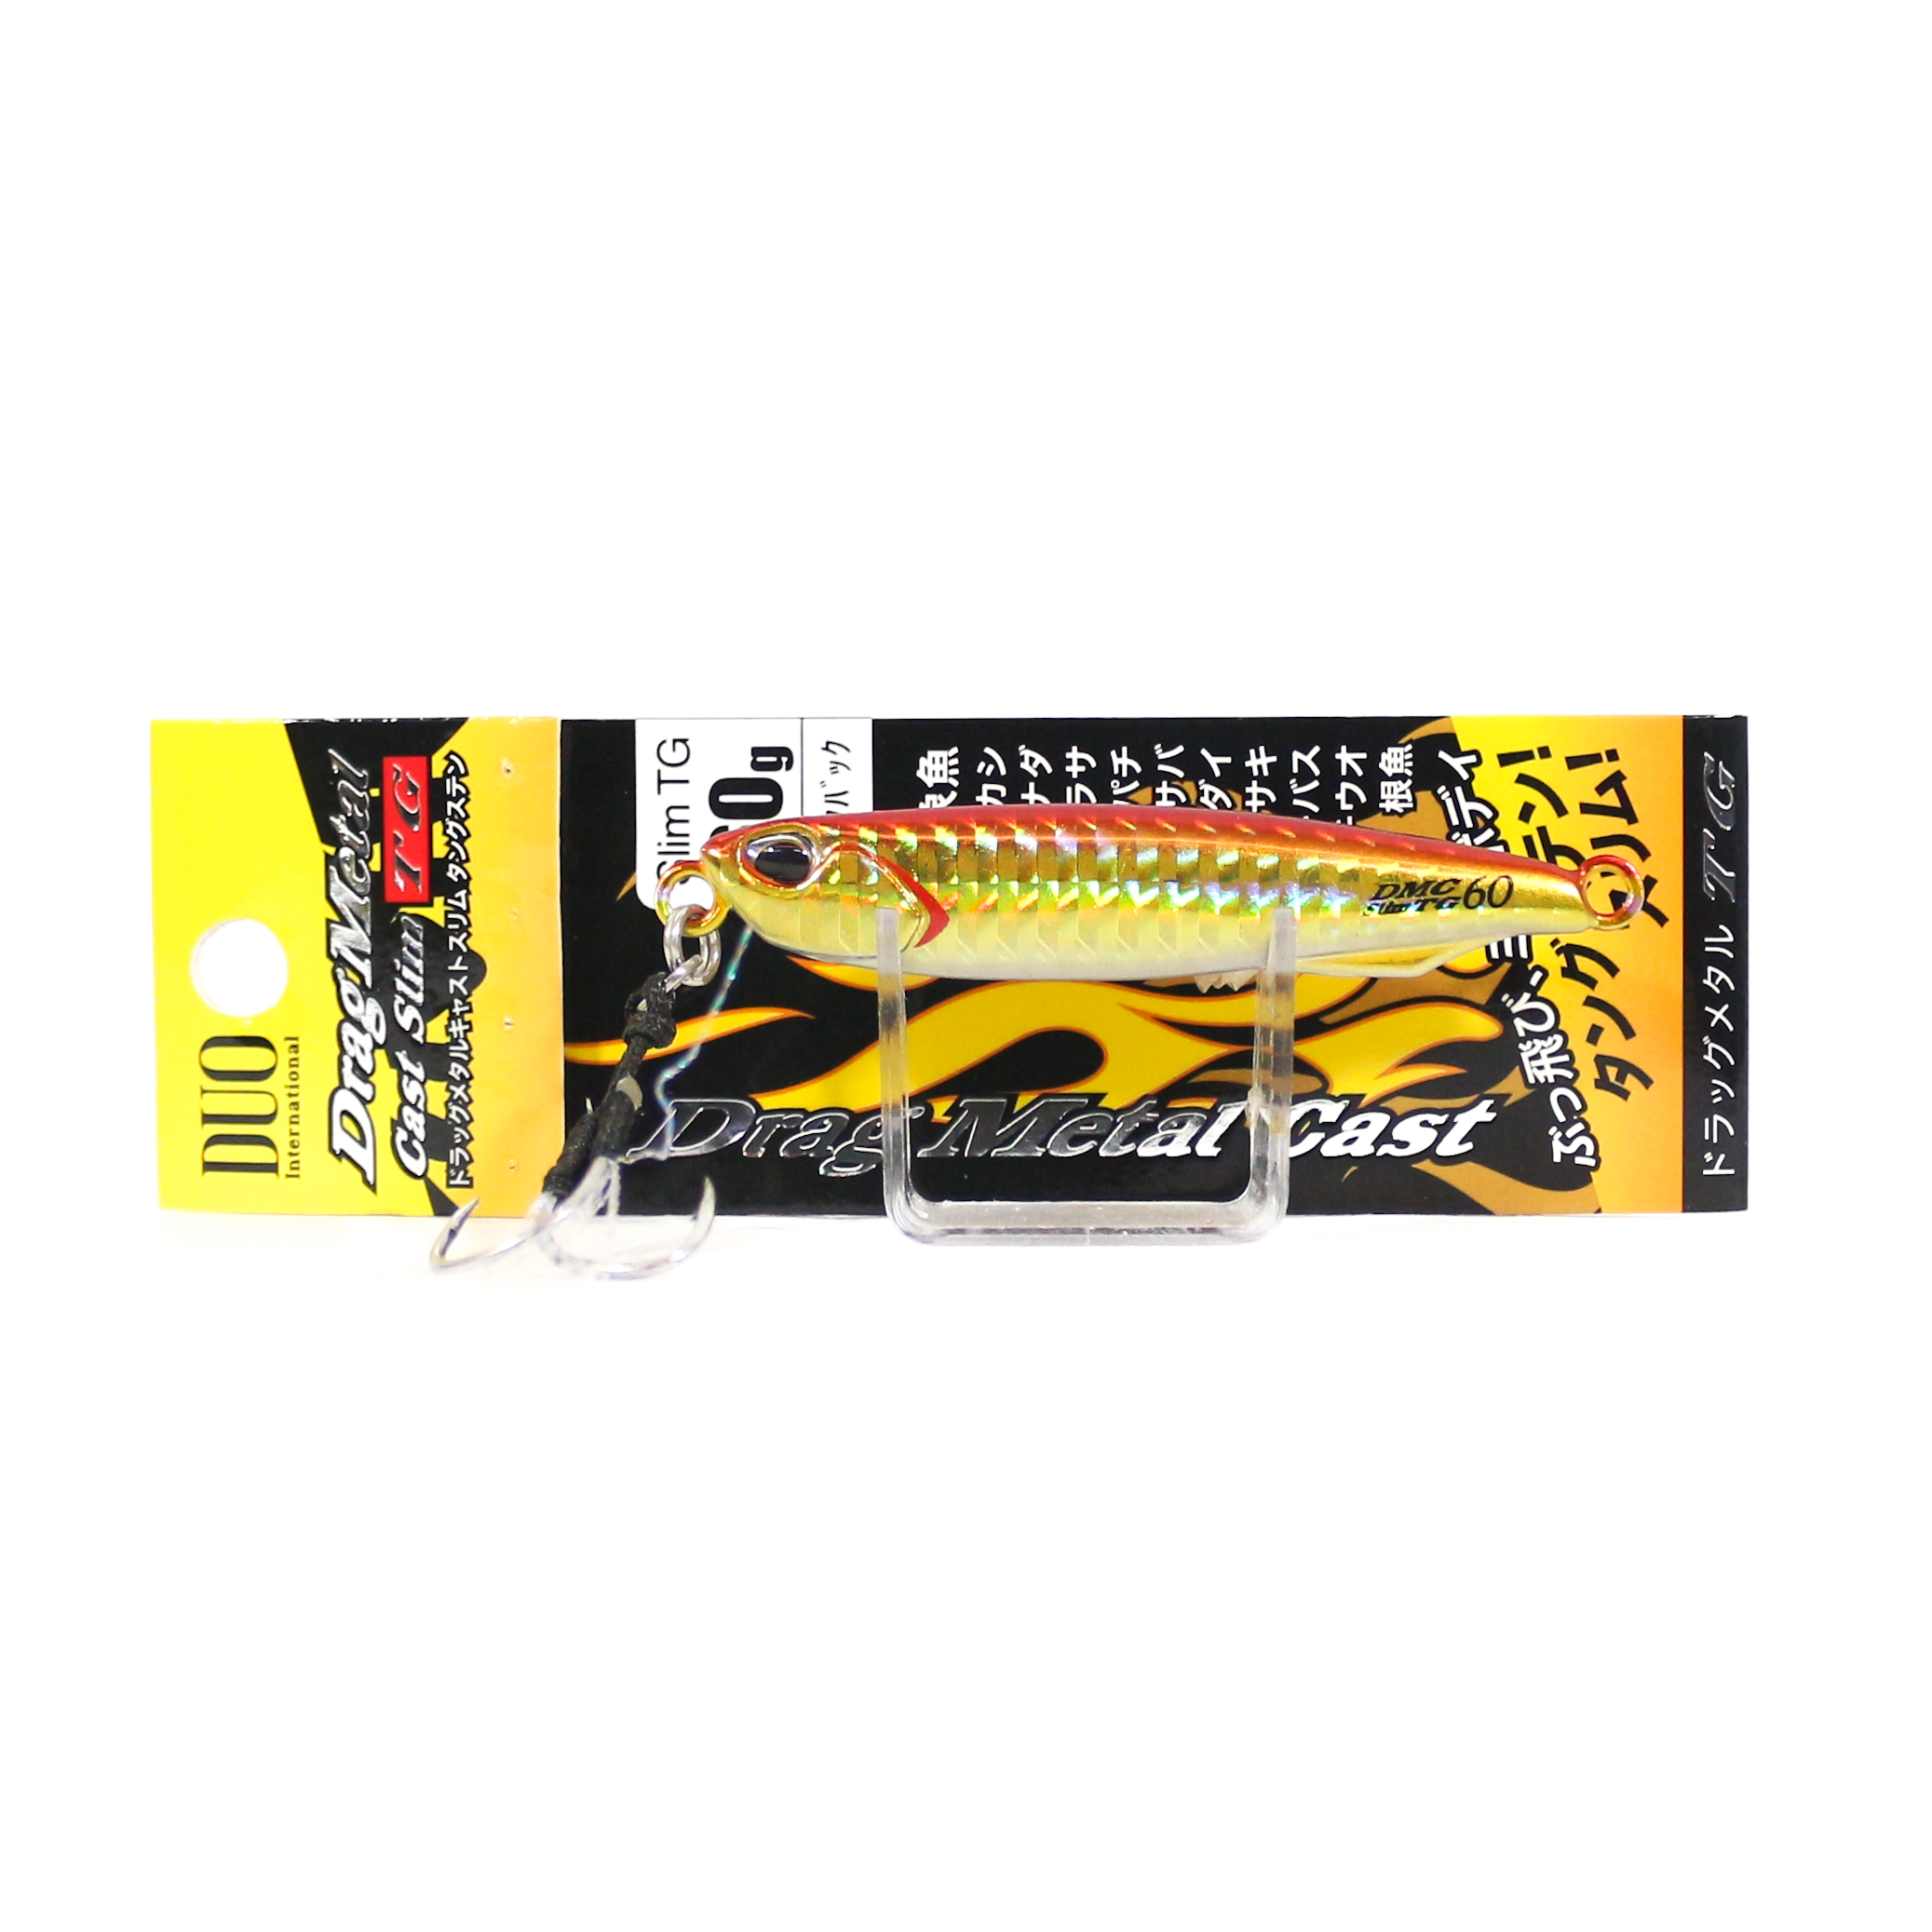 2646 Duo Metall Jig Drag Metall Cast Slim wolfram TG 60 Gramm PHA0026